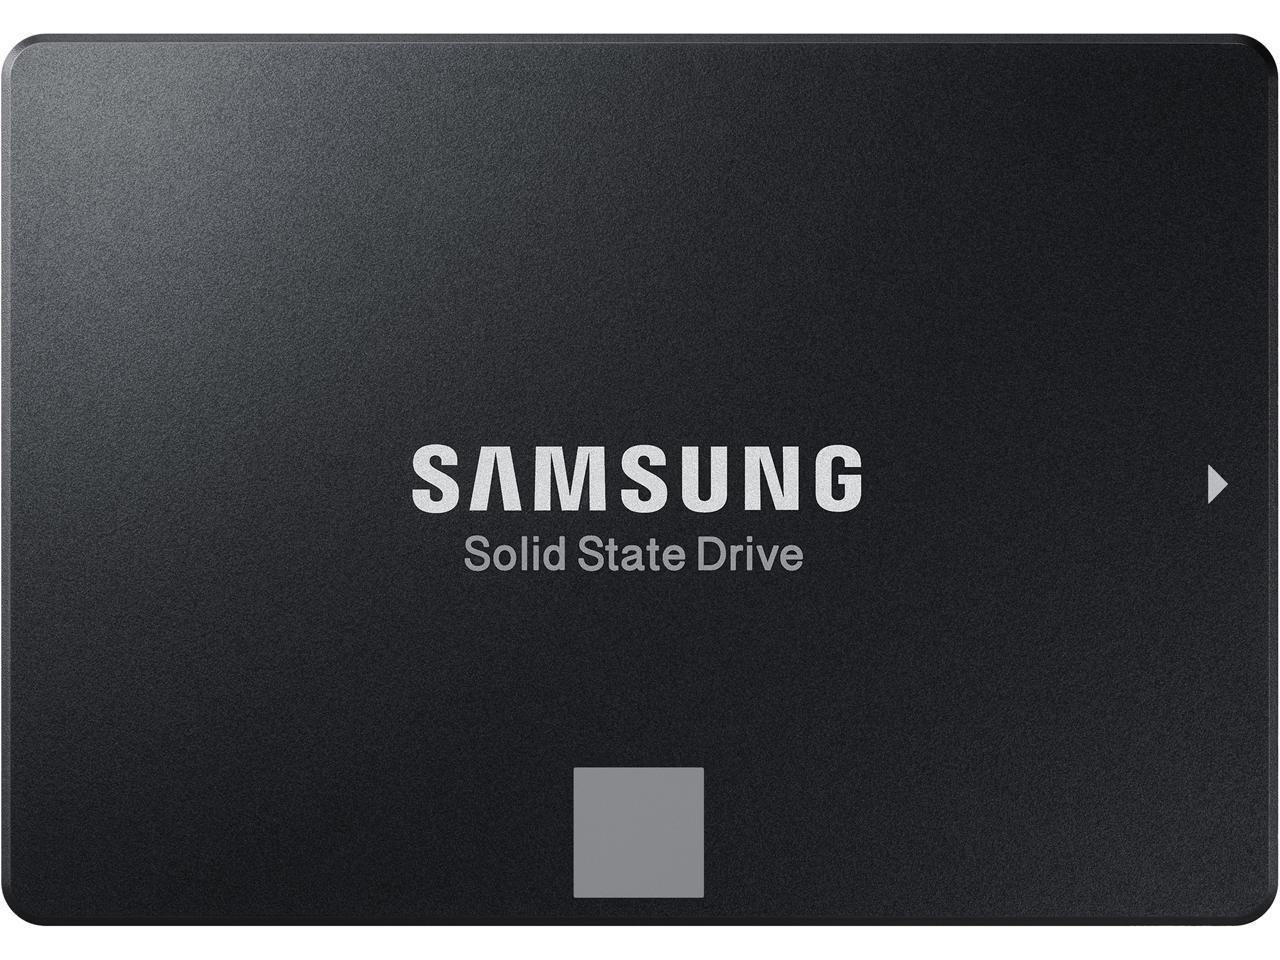 "SAMSUNG 860 EVO Series 2.5"" 1TB SATA III V-NAND Internal Solid State Drive (SSD) MZ-76E1T0B/AM"